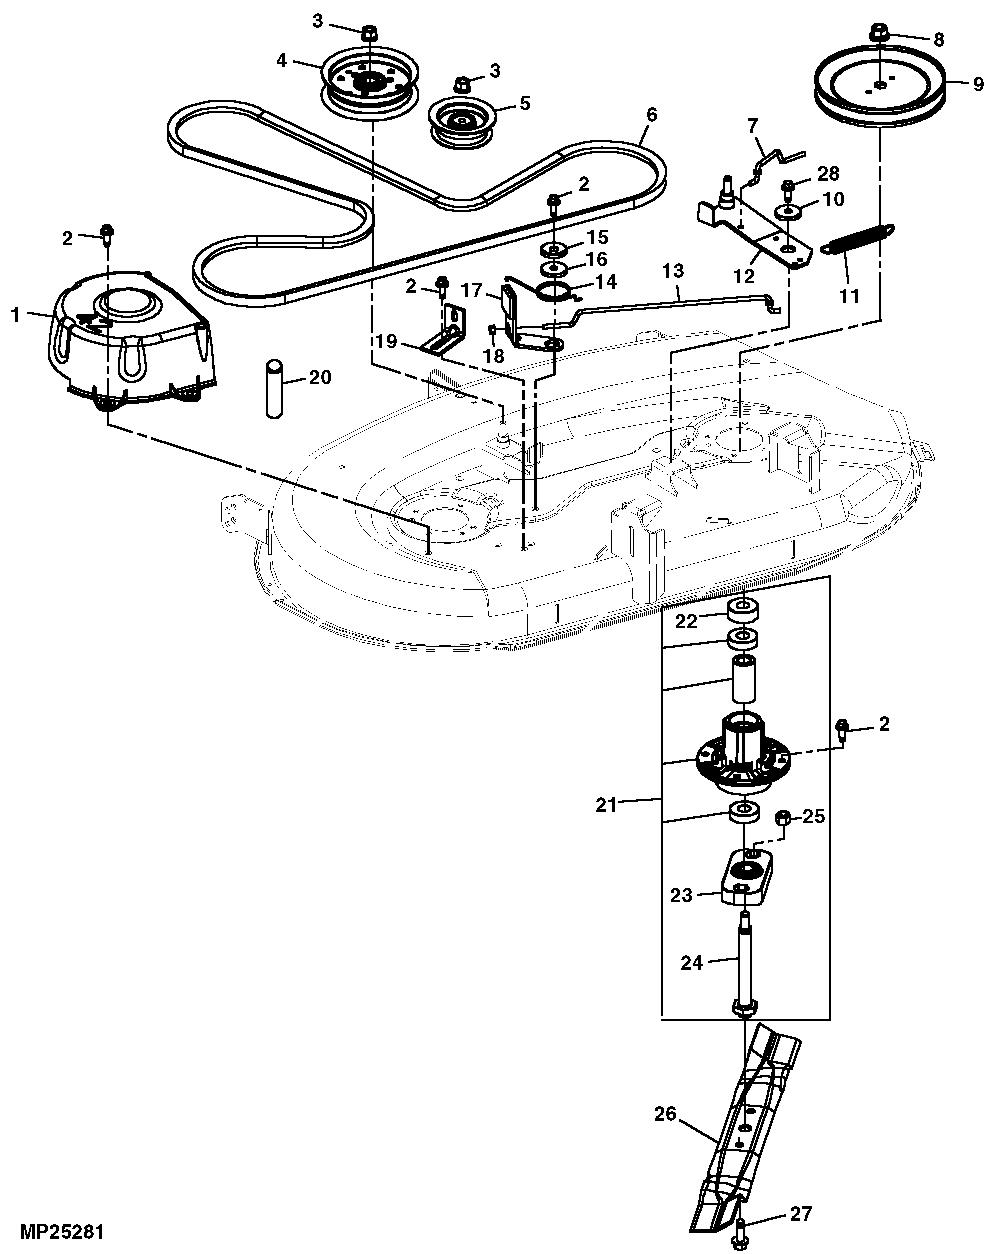 John Deere Z225 Parts Diagram   John Deere Parts: John Deere Parts ...